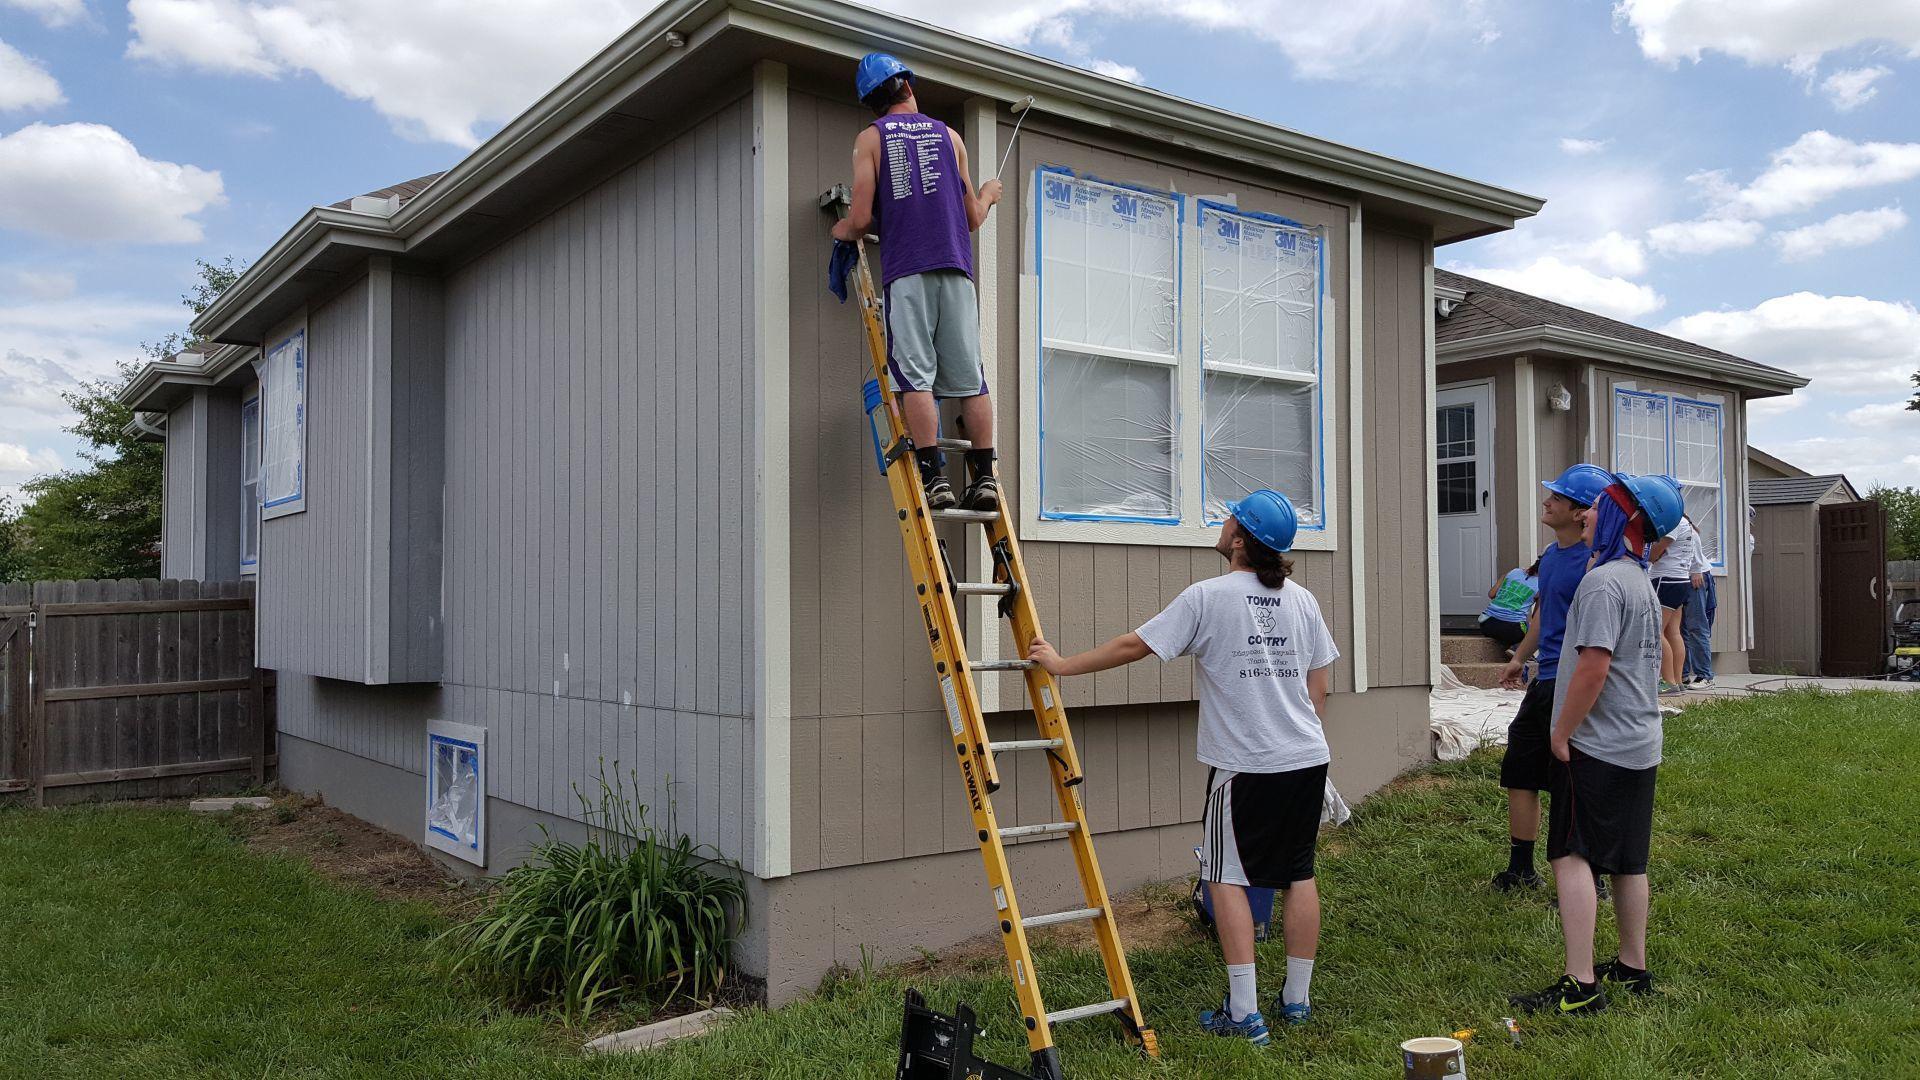 Home Painting Business:https://columbustelegram.com